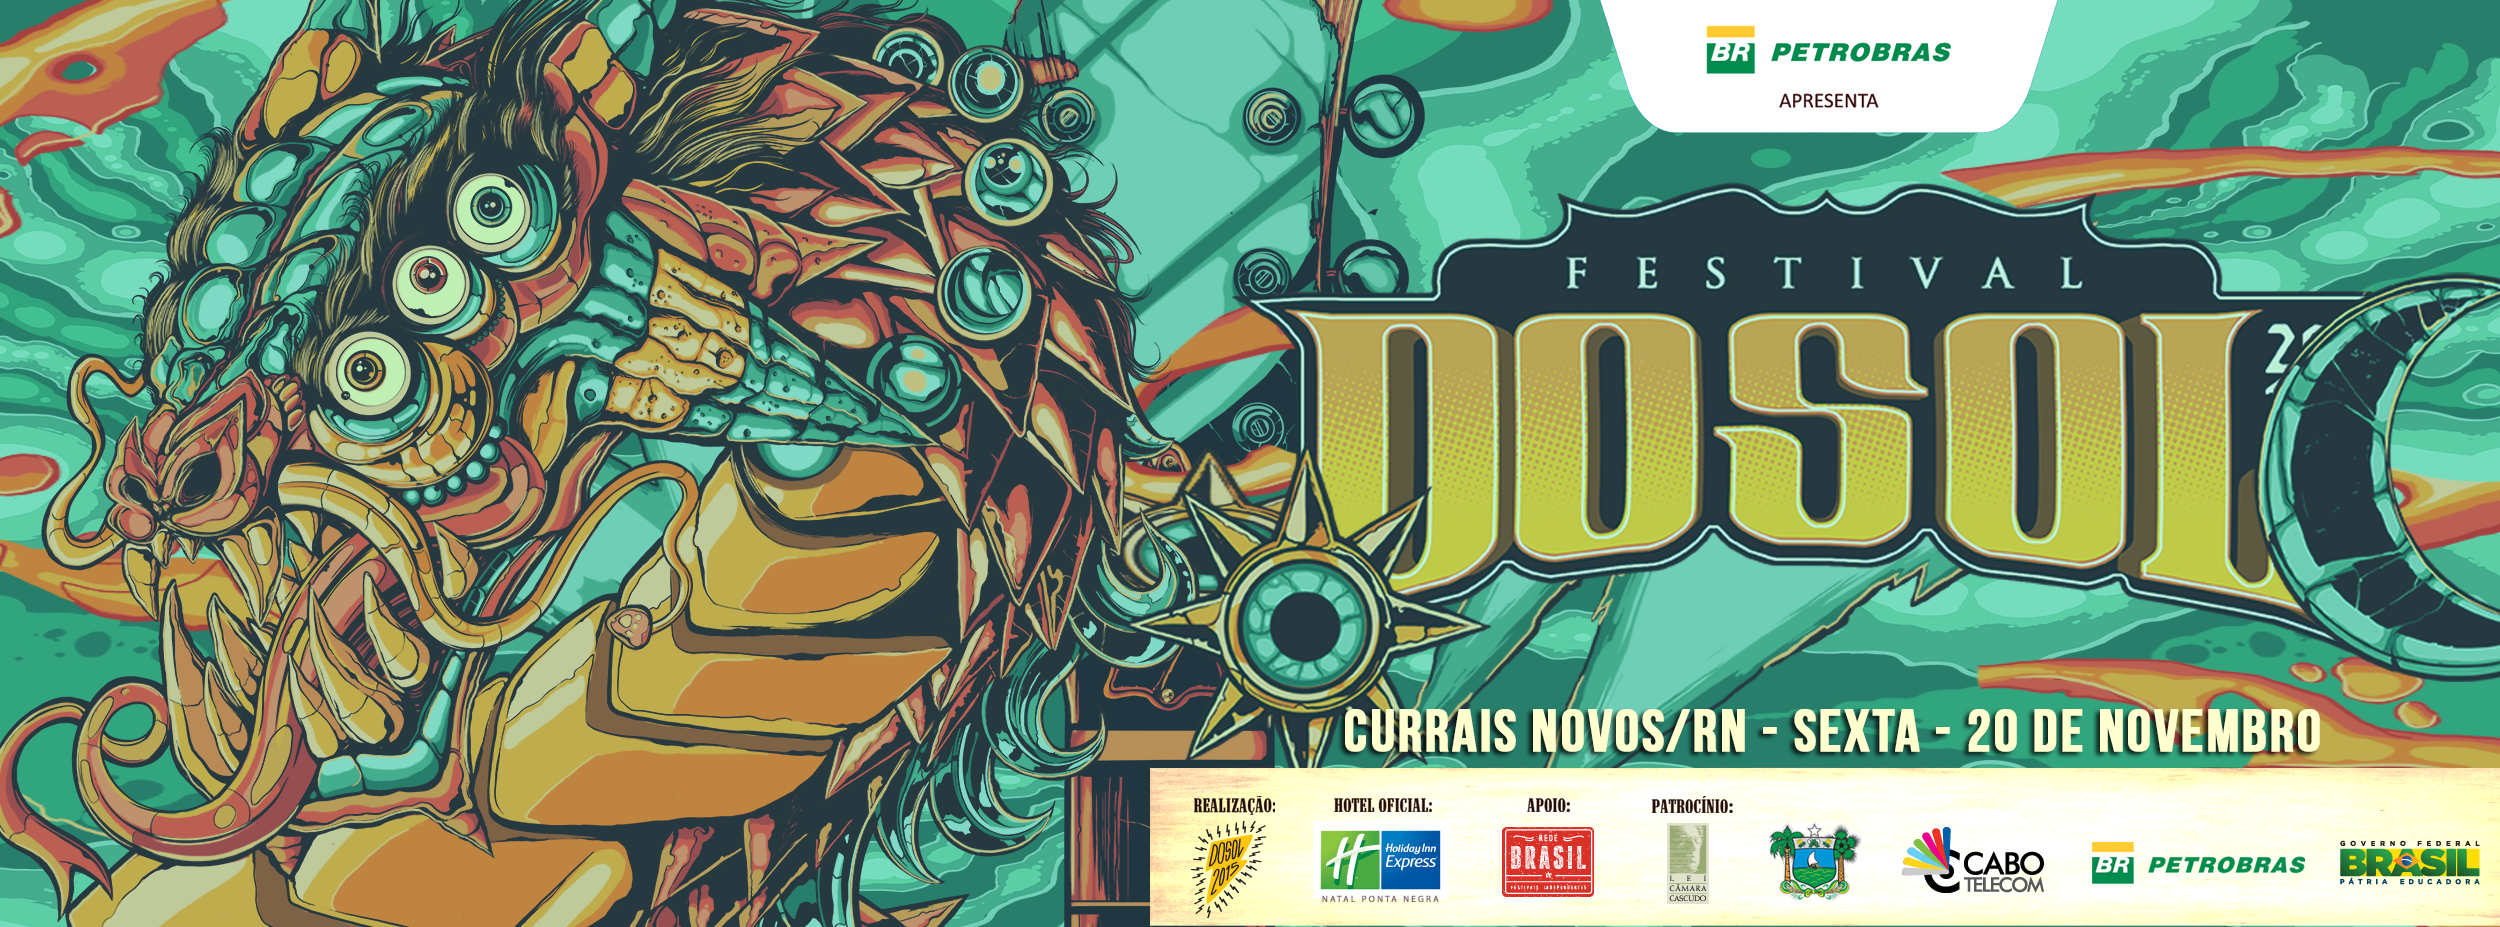 Festival DoSol 2015 – Currais Novos/RN